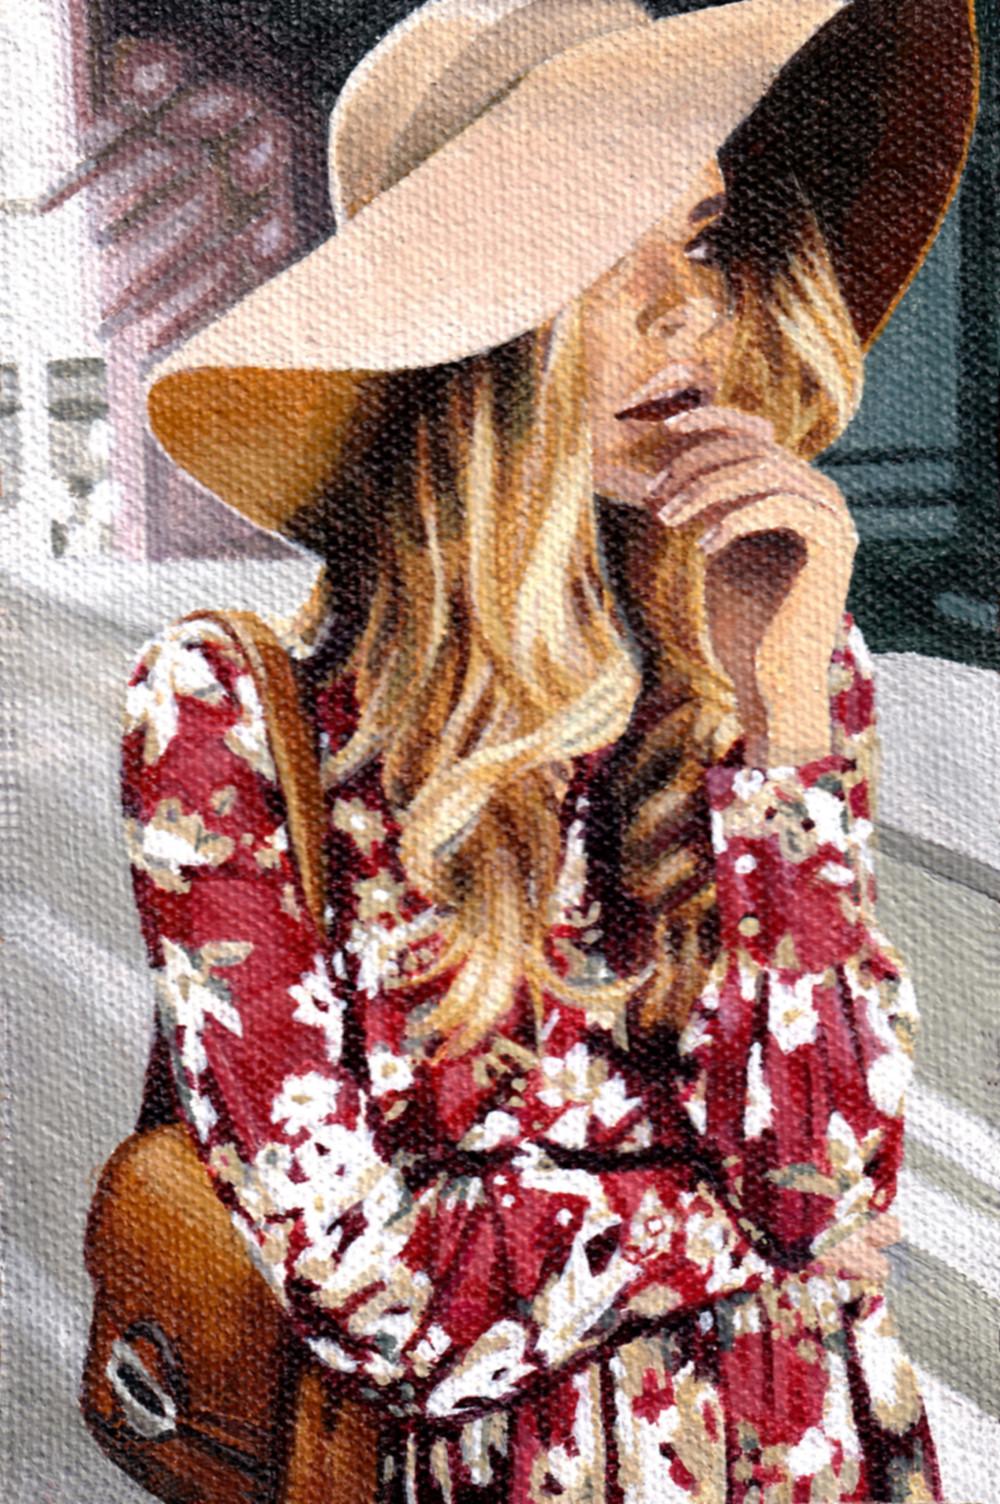 Fashion art, blonde woman lost in the city, jennie rutz, jacinta emms